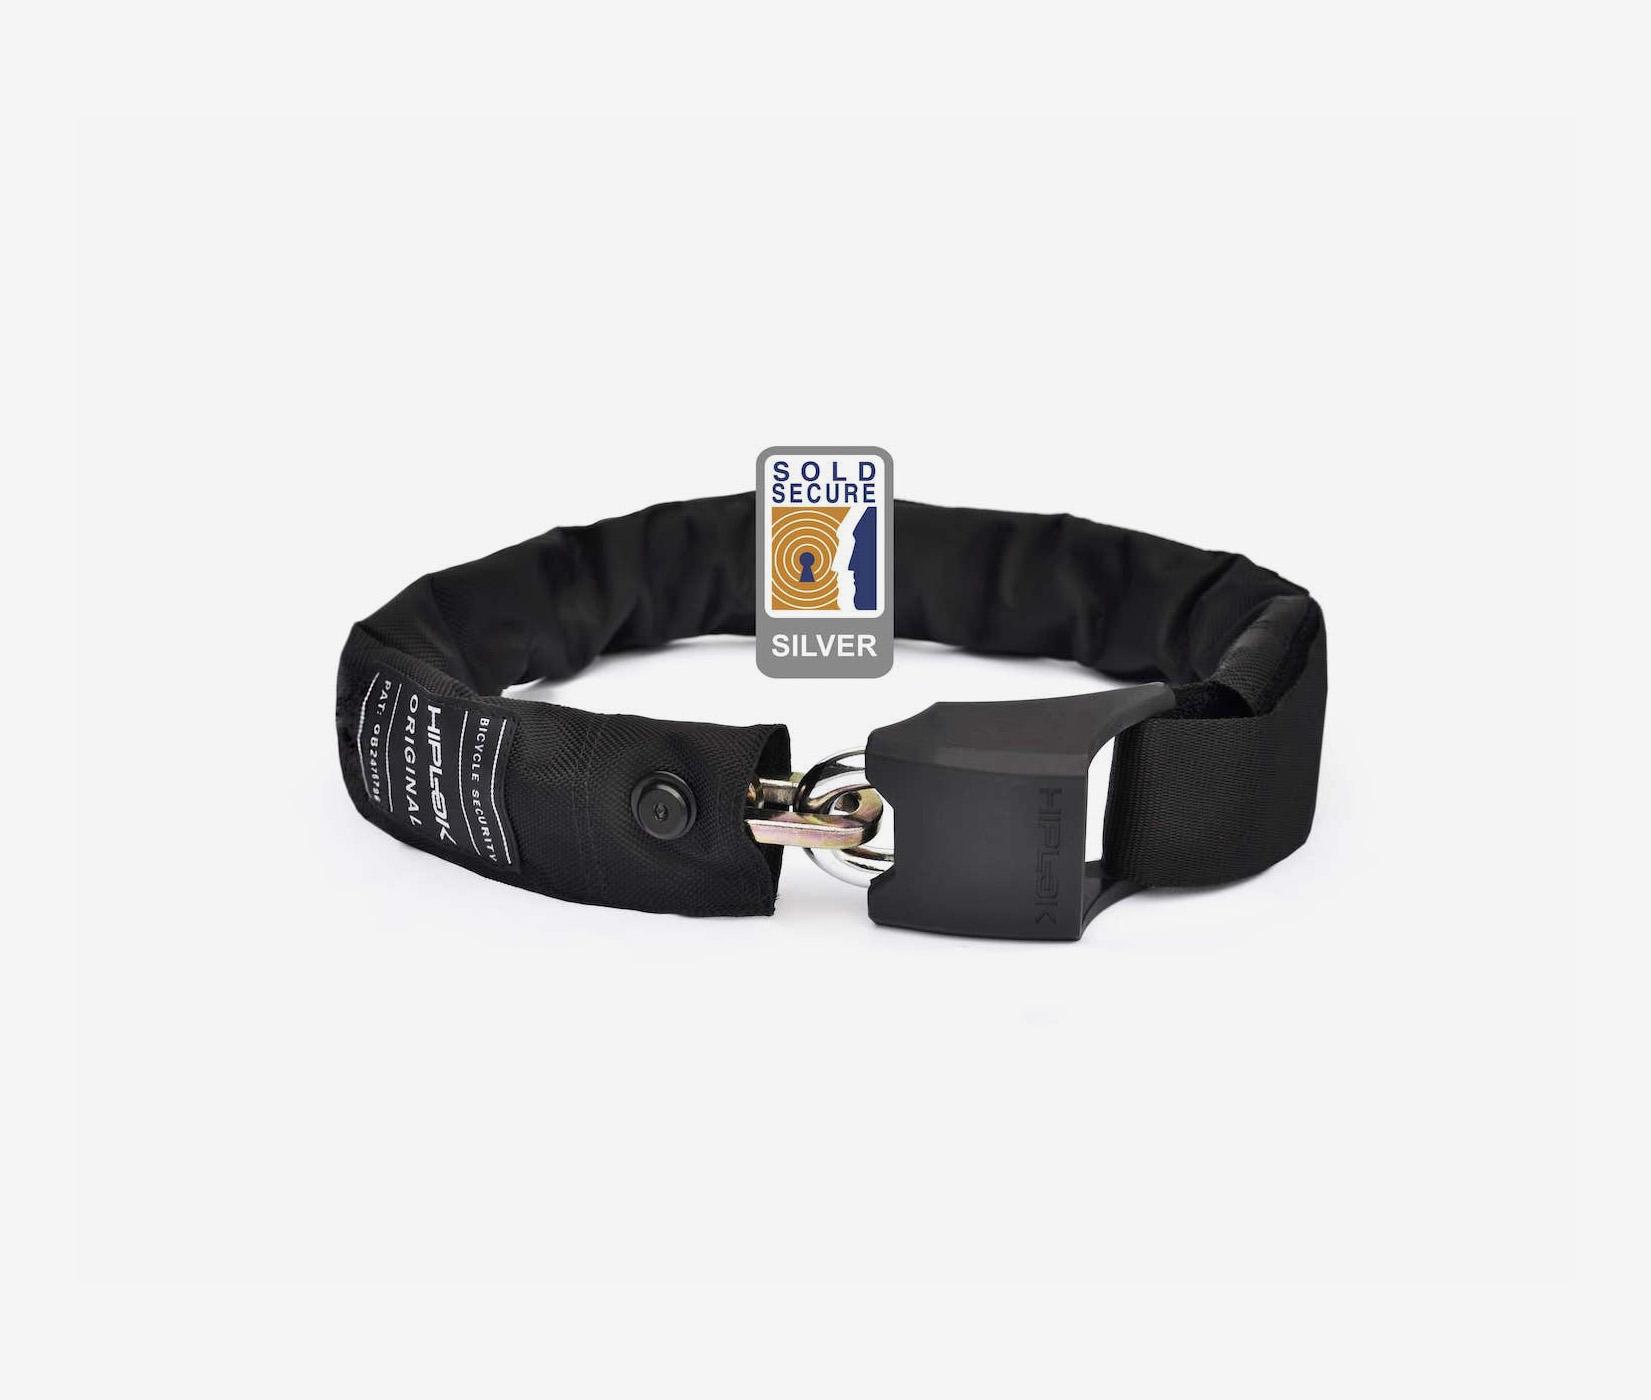 Hiplok original wearable chain lock bike lock sold secure black